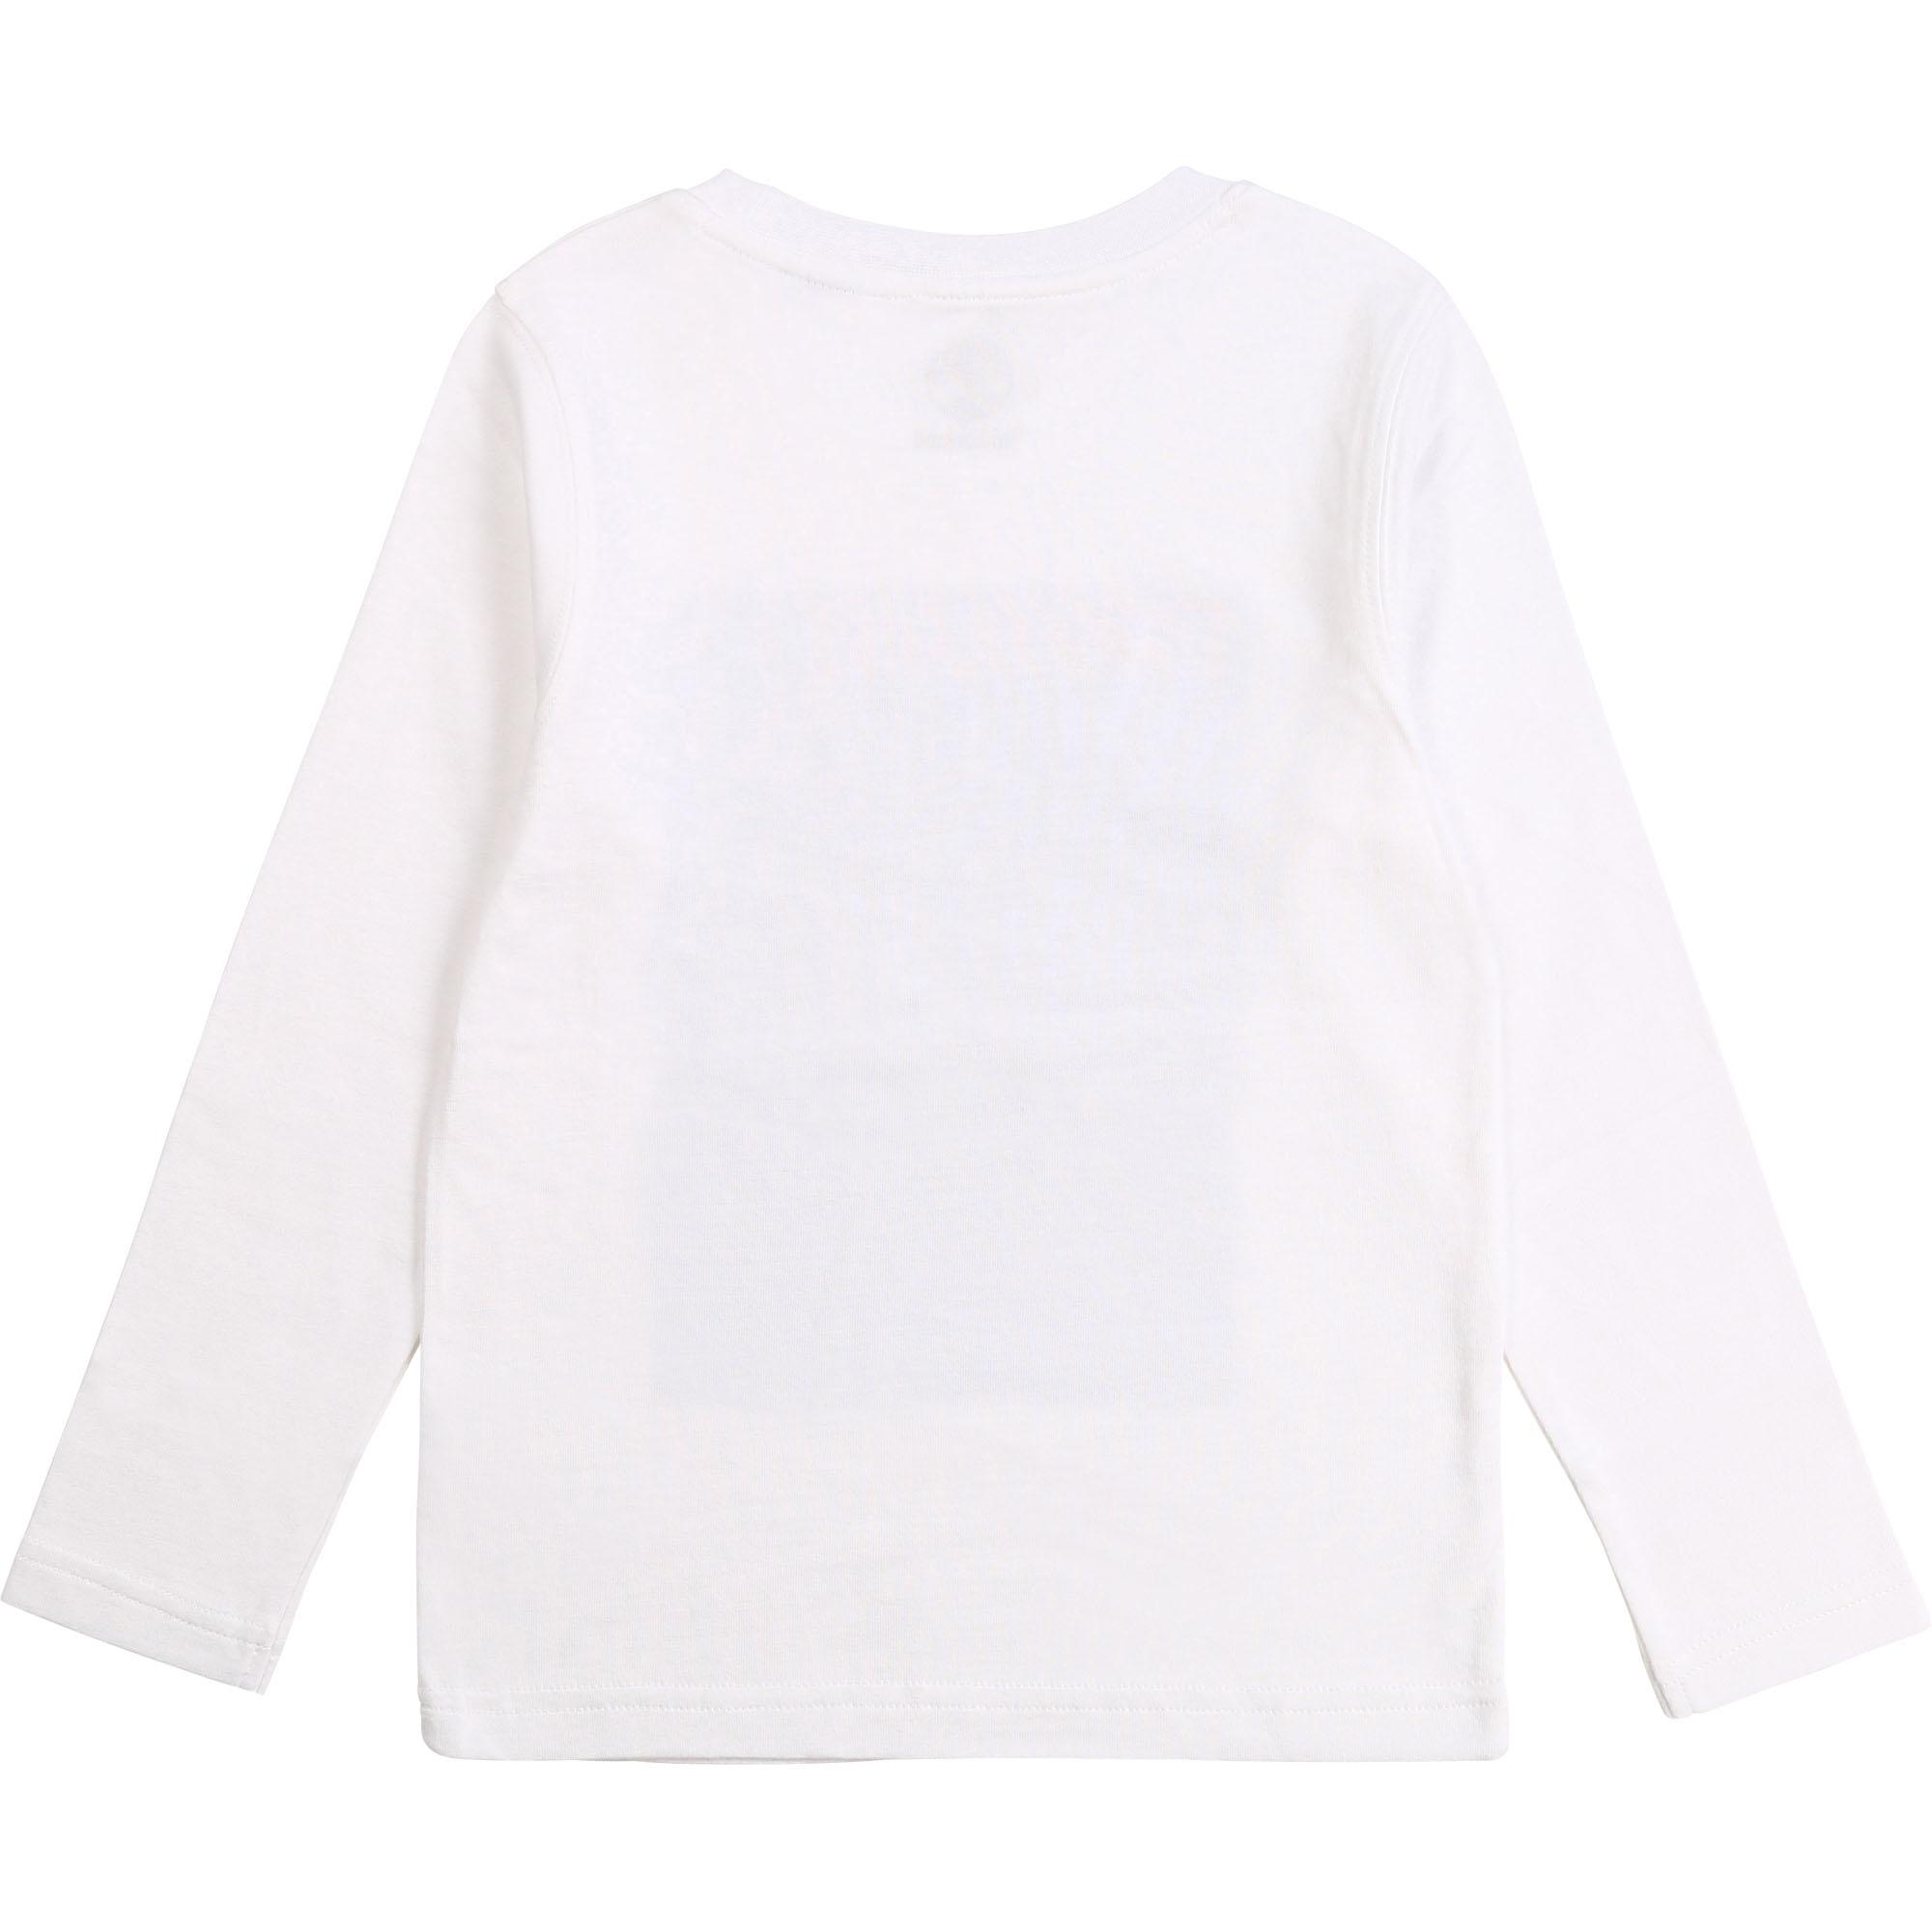 TIMBERLAND t-shirt en coton biologique-4